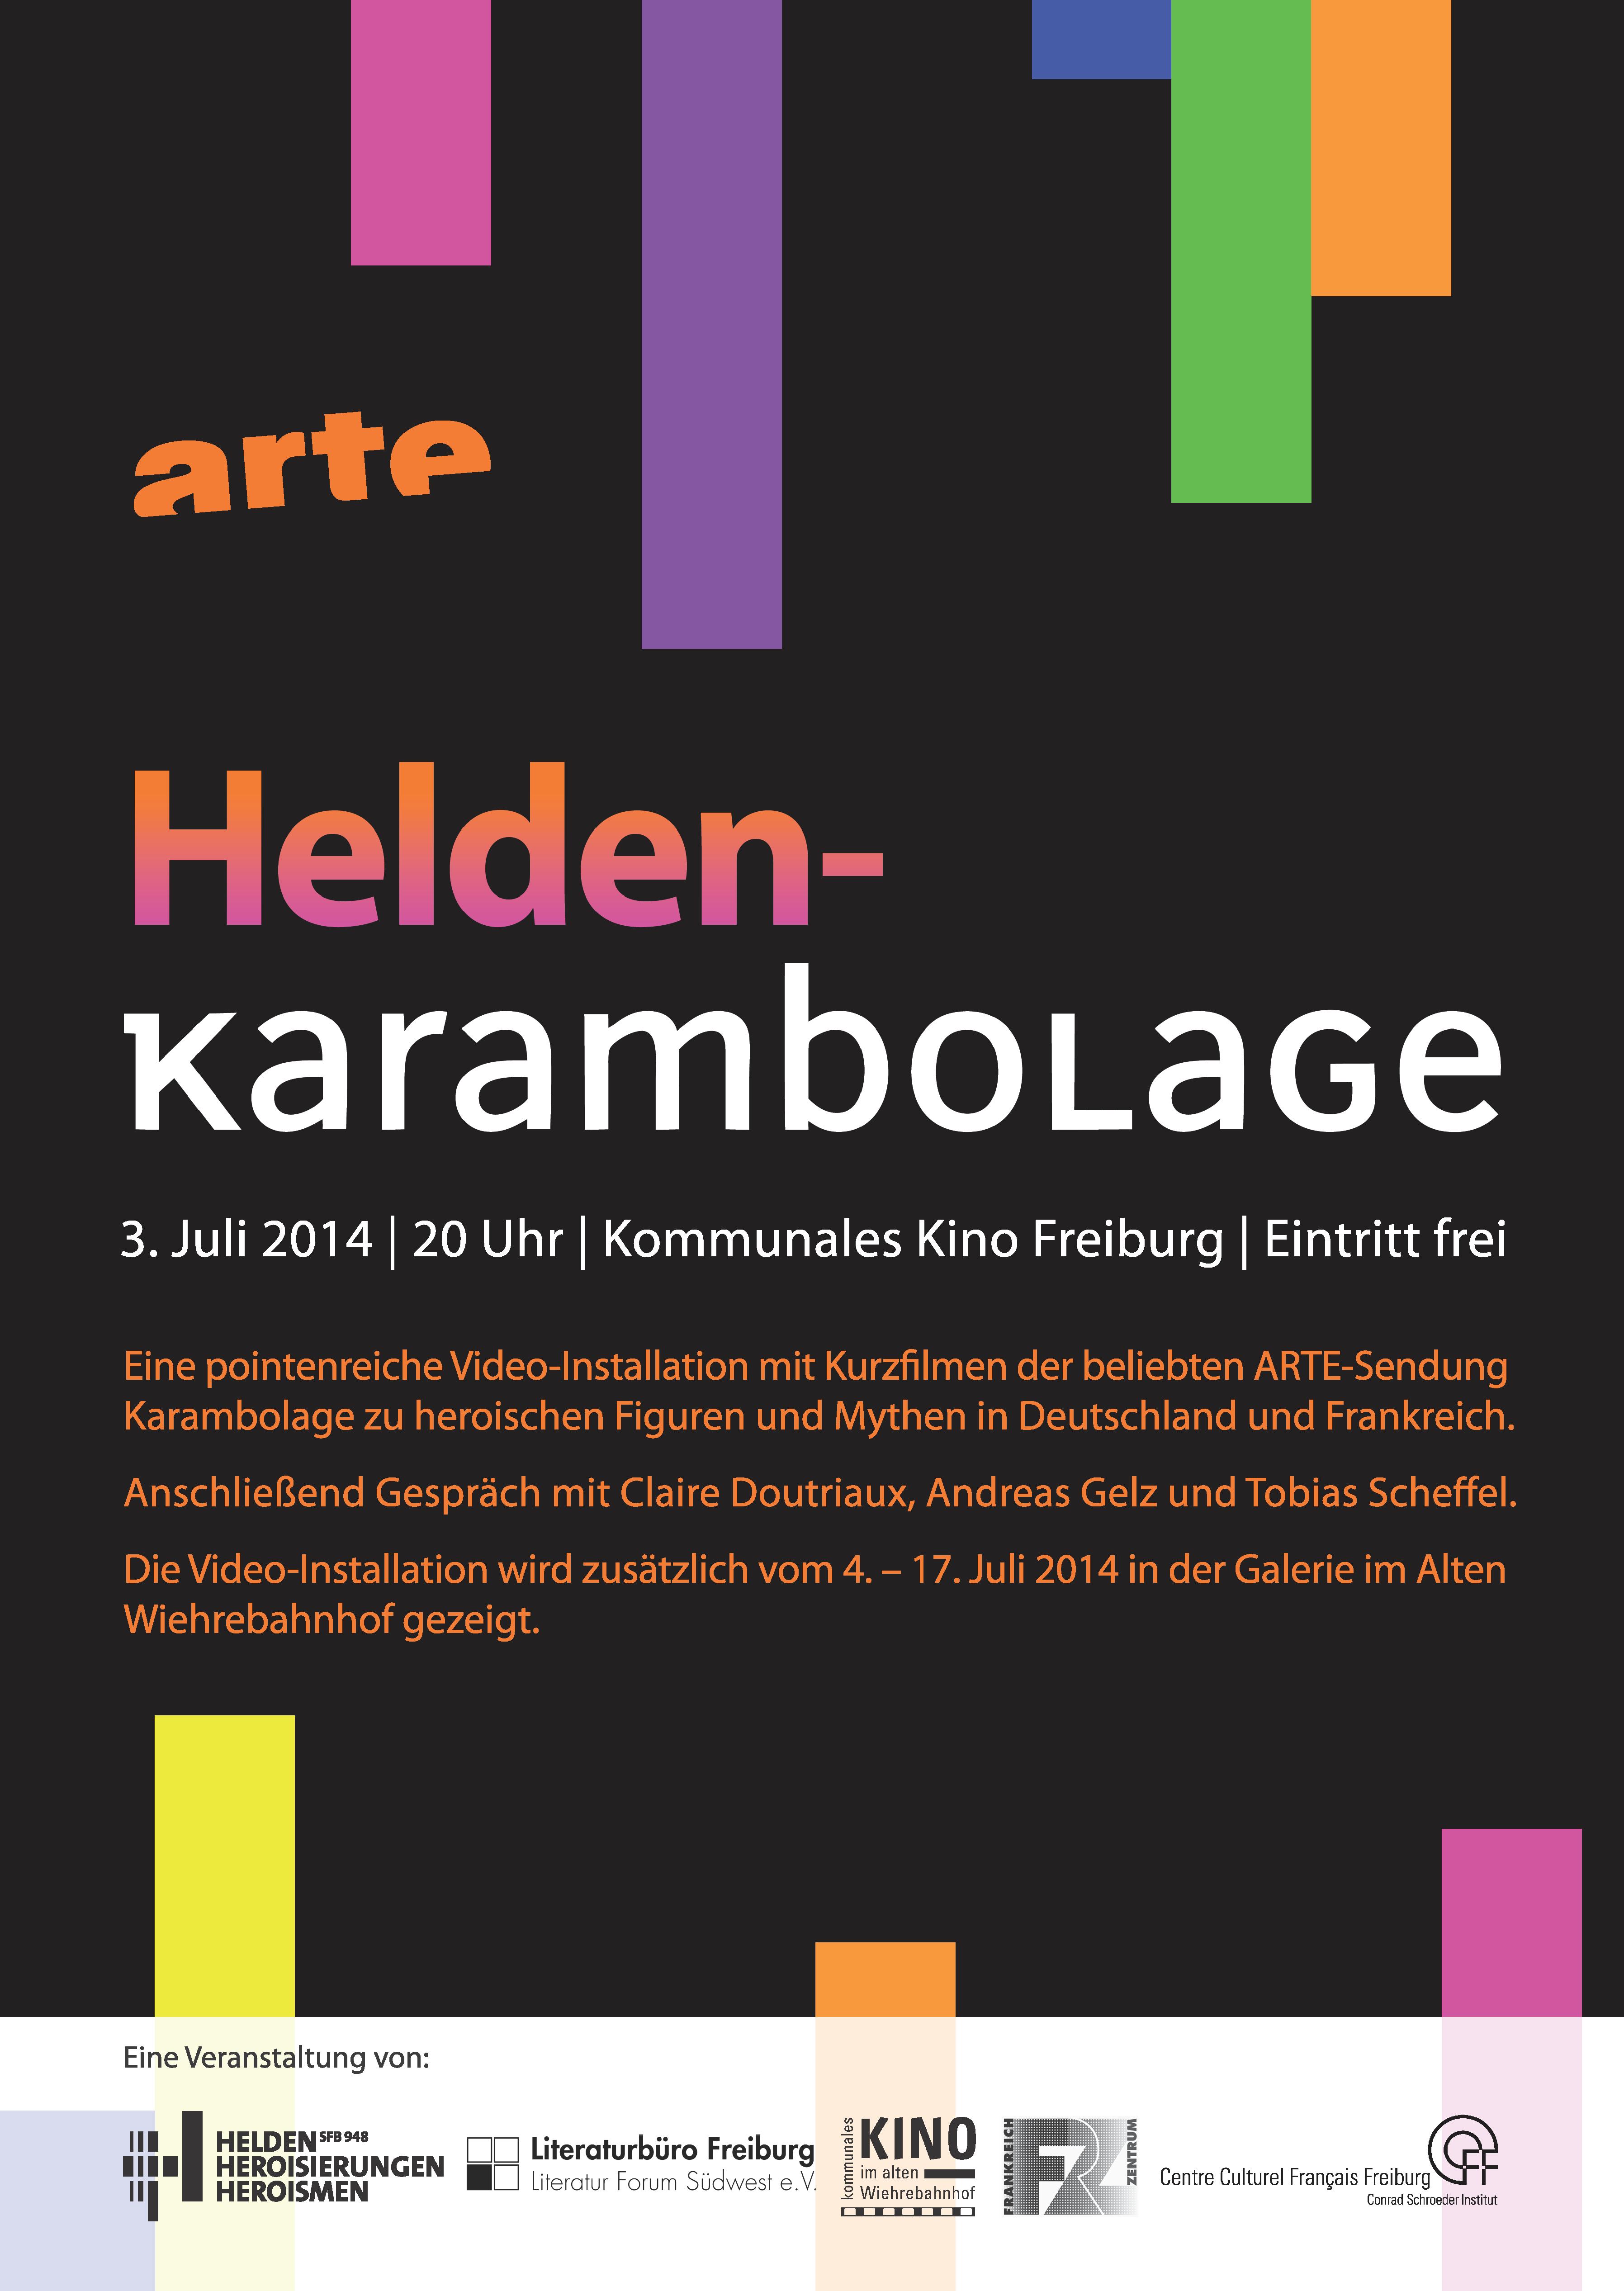 Helden-Karambolage_Plakat.png